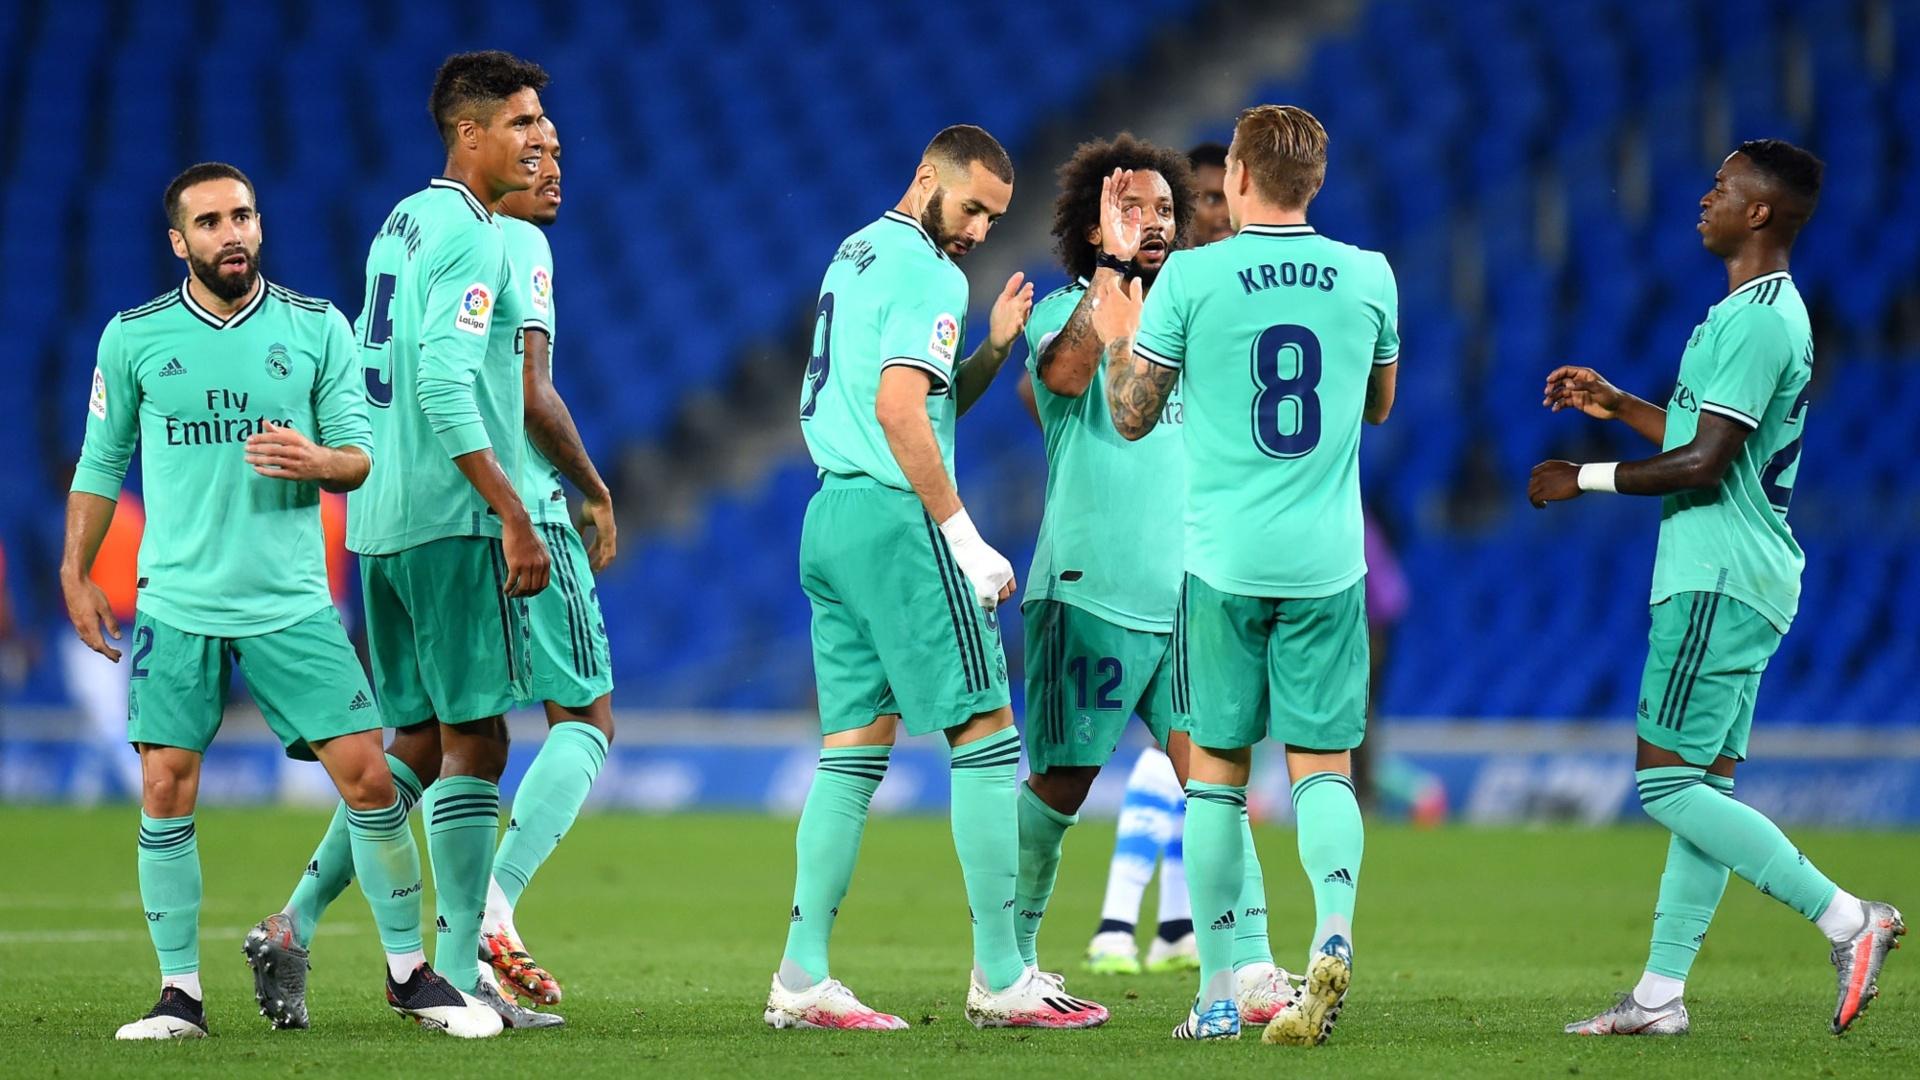 Match report: Real Sociedad 1-2 Real Madrid